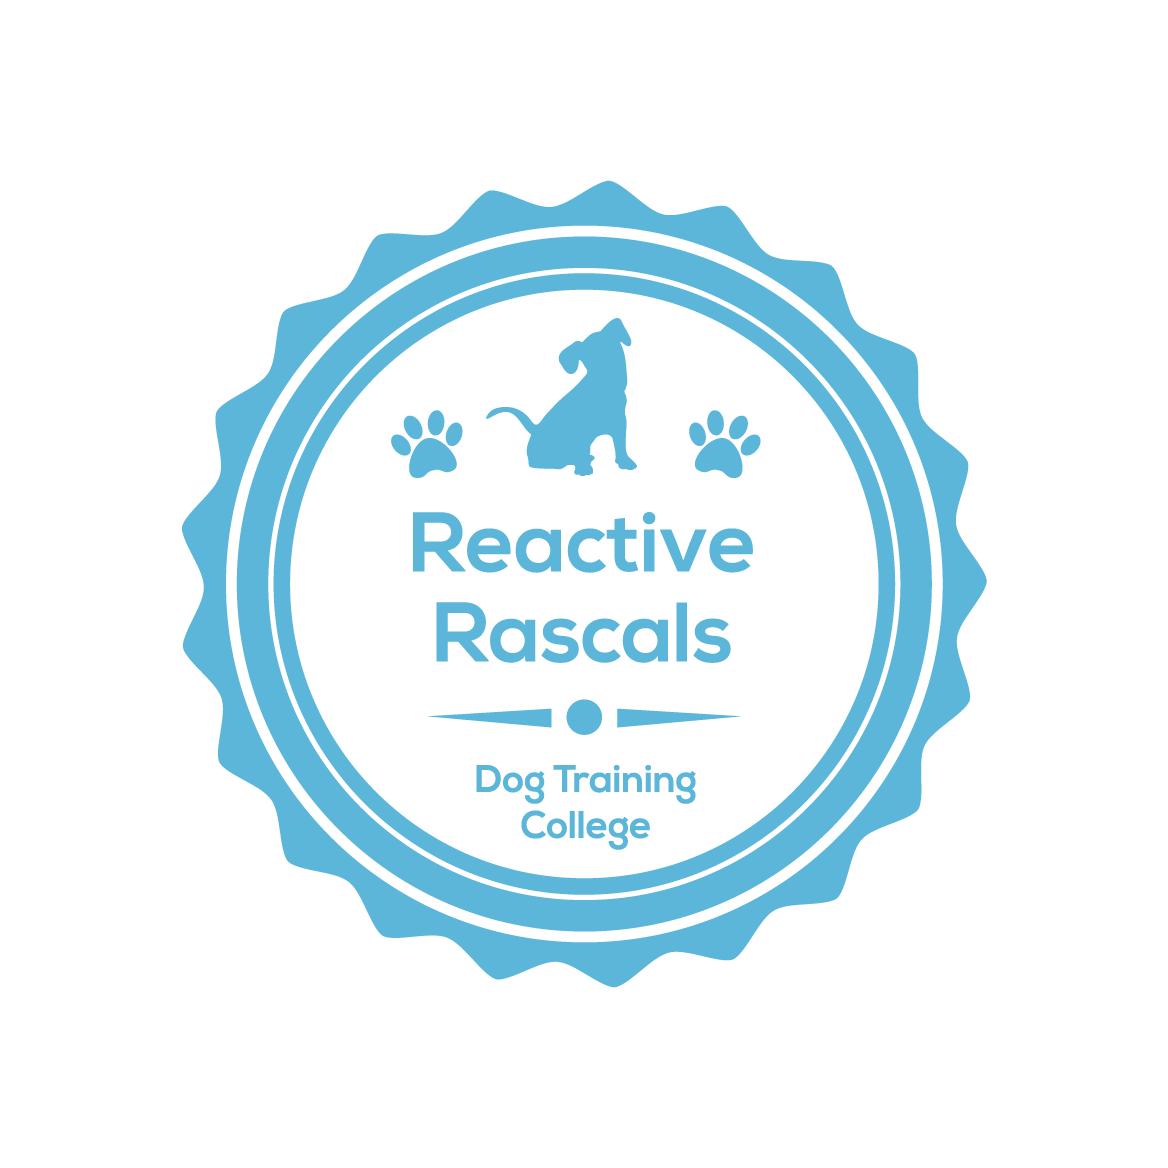 Reactive Rascals Dog Training College